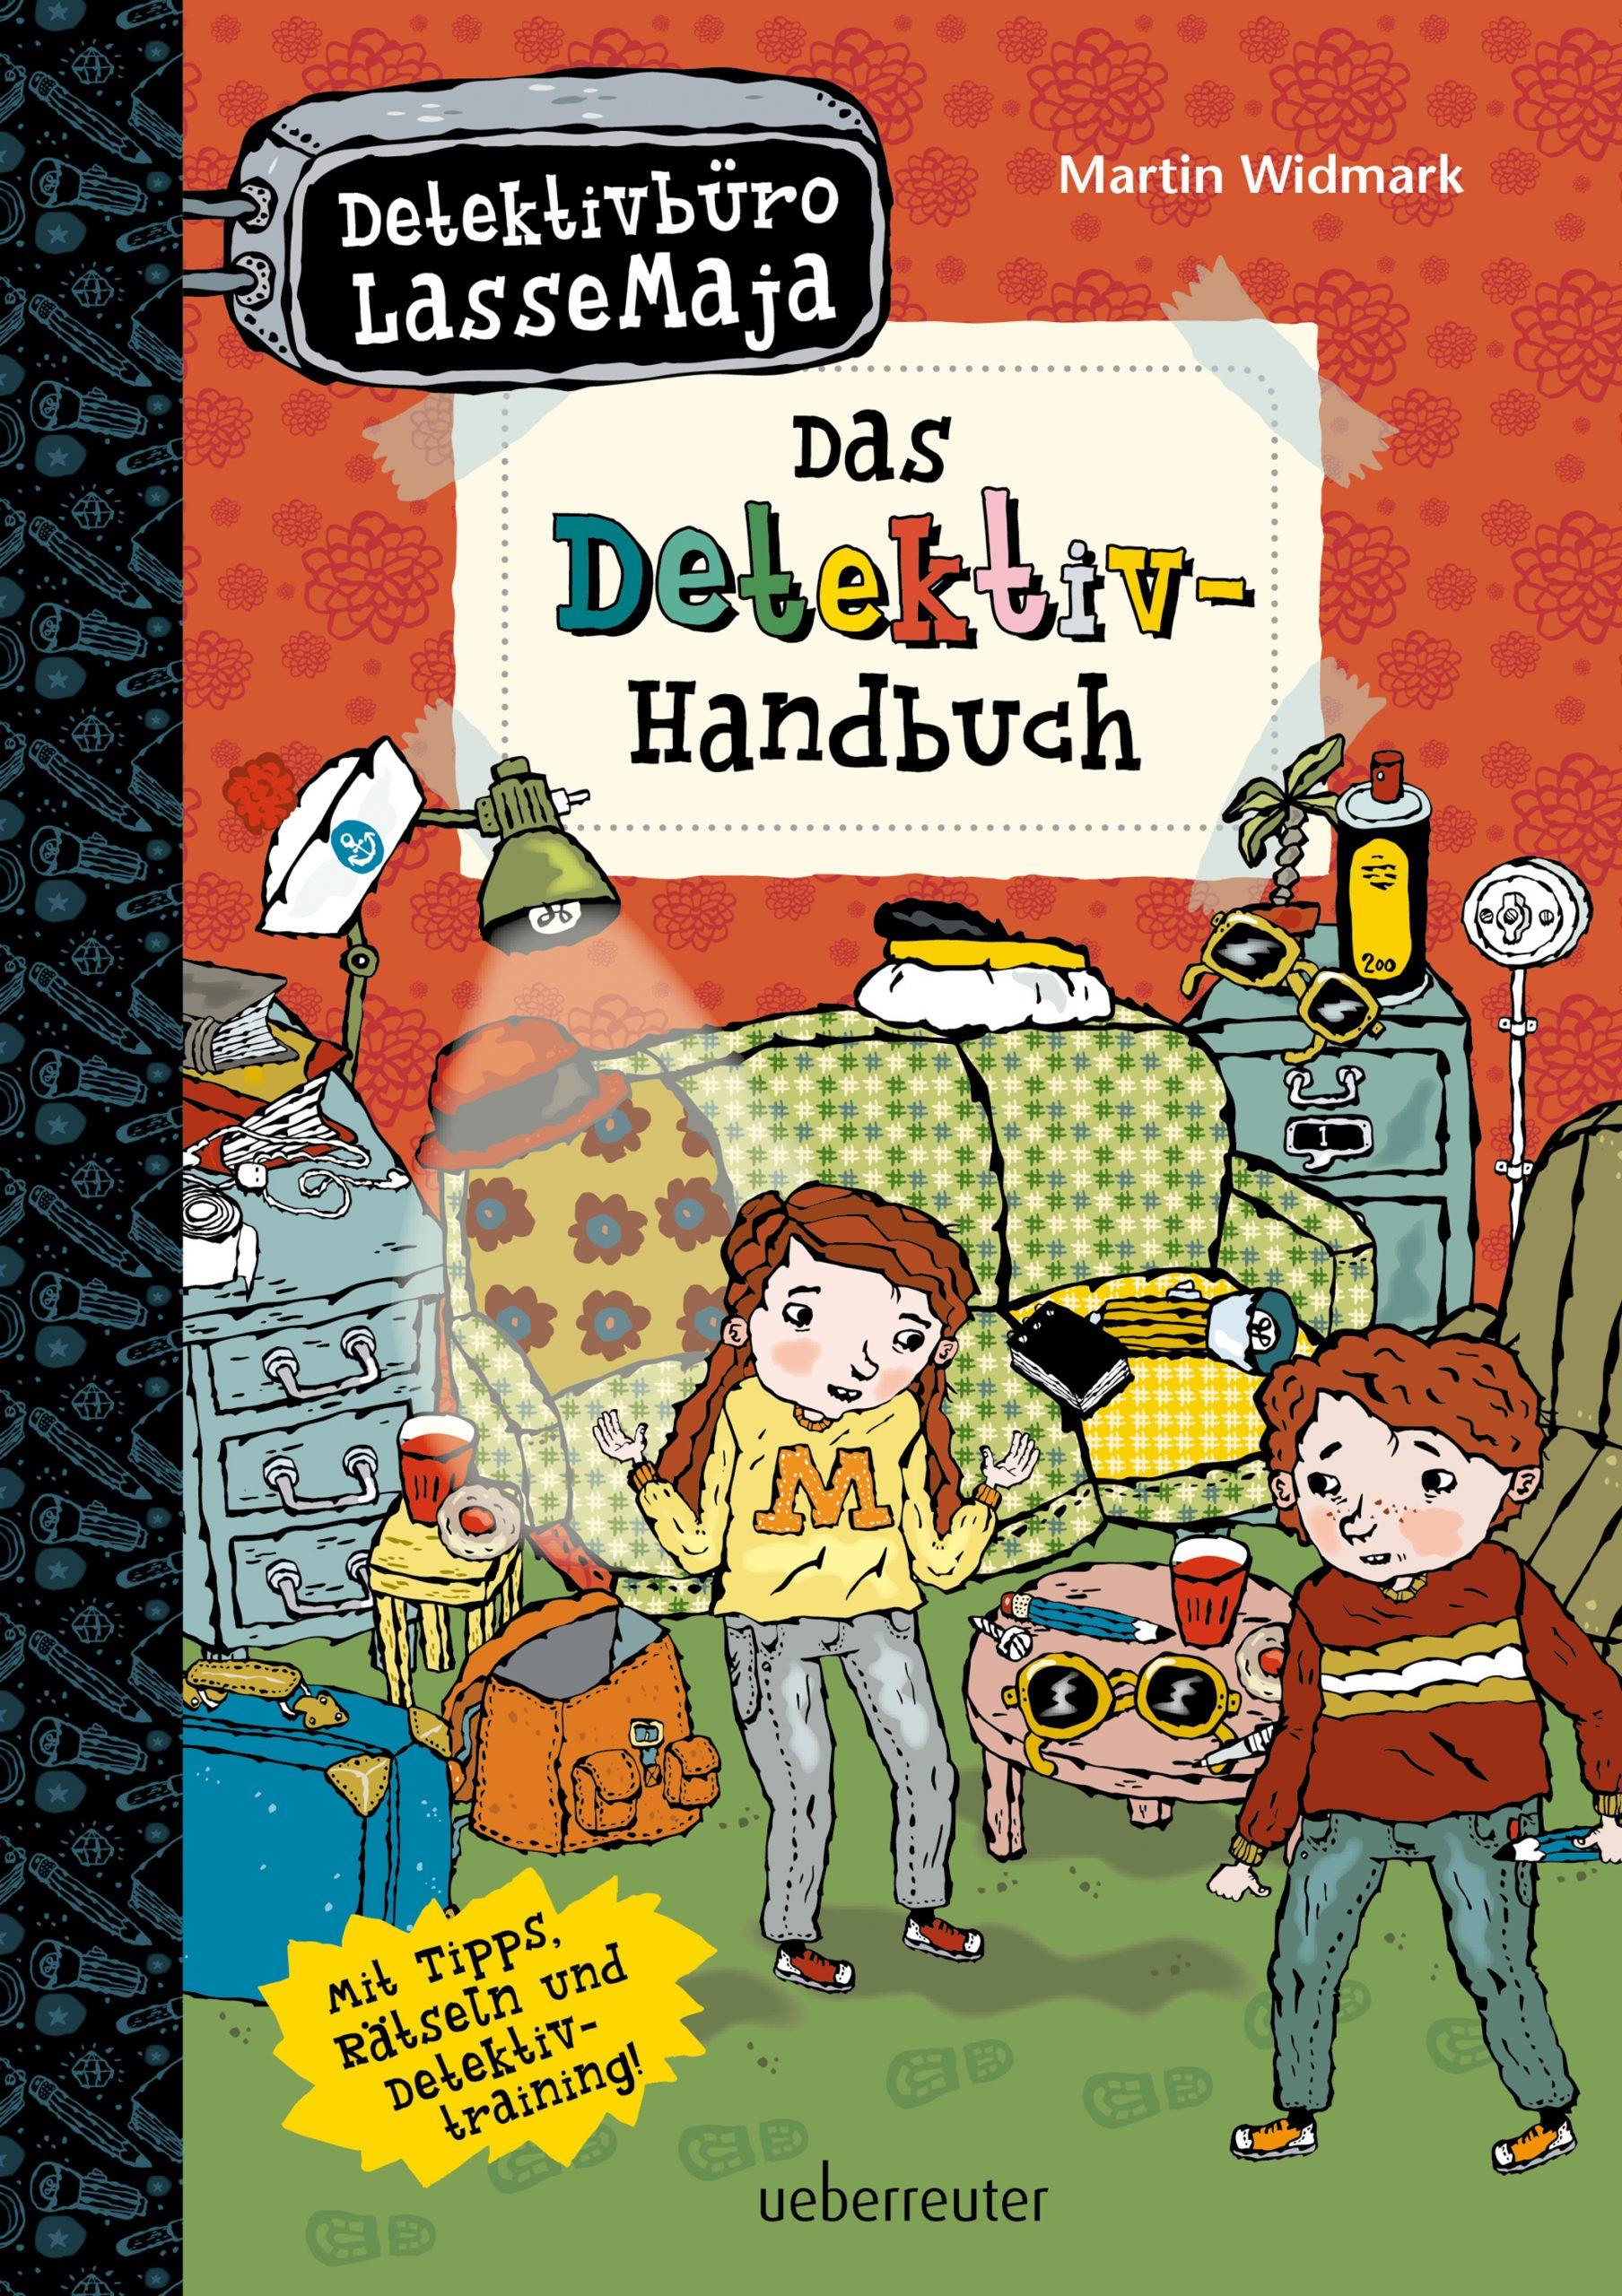 Detektivbüro LasseMaja – Das Detektiv-Handbuch